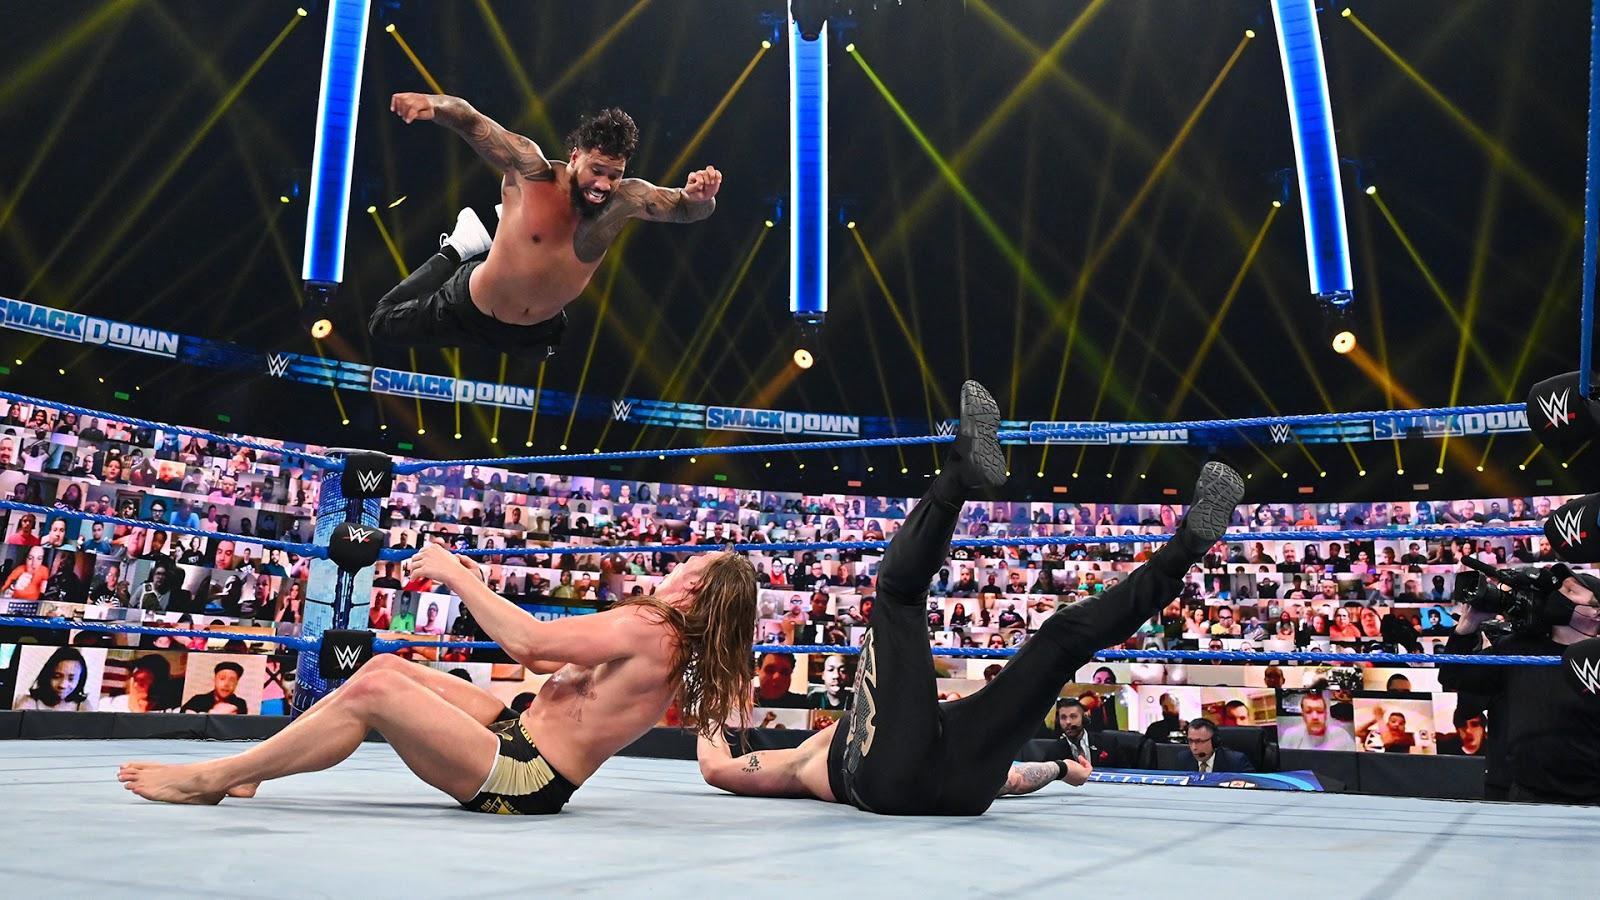 Jey Uso vai enfrentar Roman Reigns no Clash of Champions